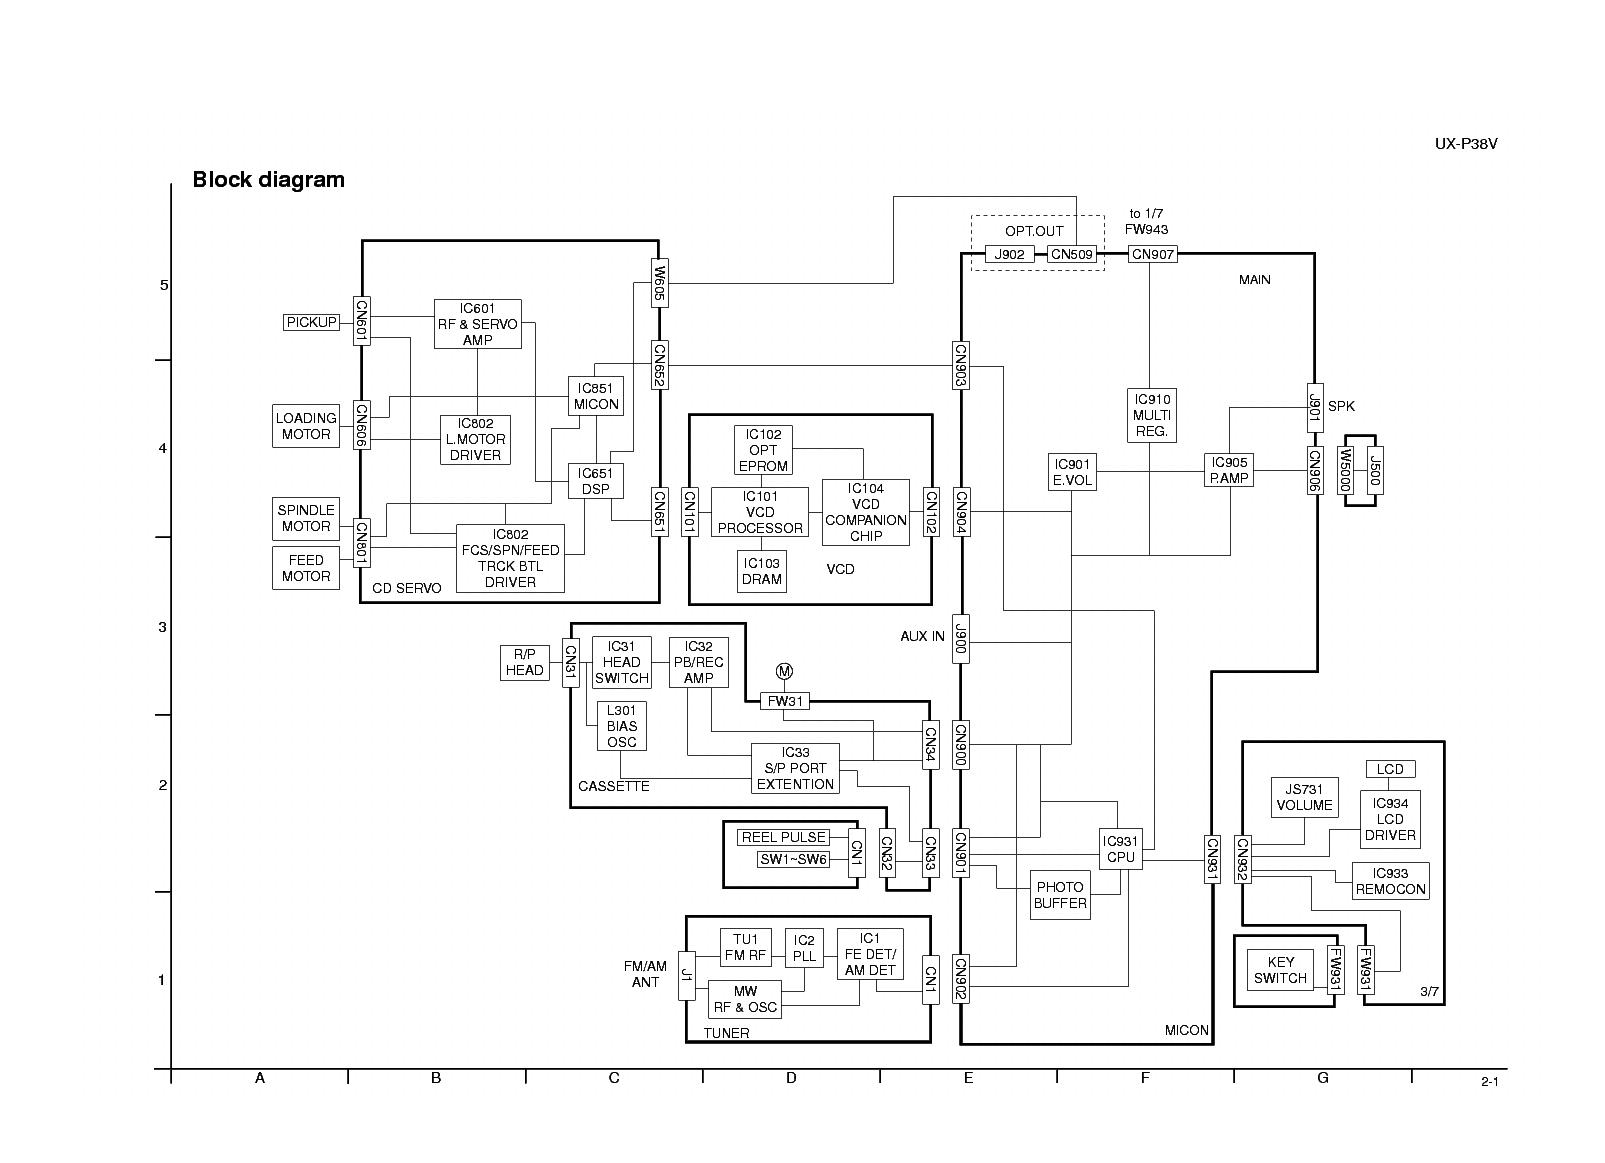 Jvc Ax 222bk Service Manual Free Download Schematics